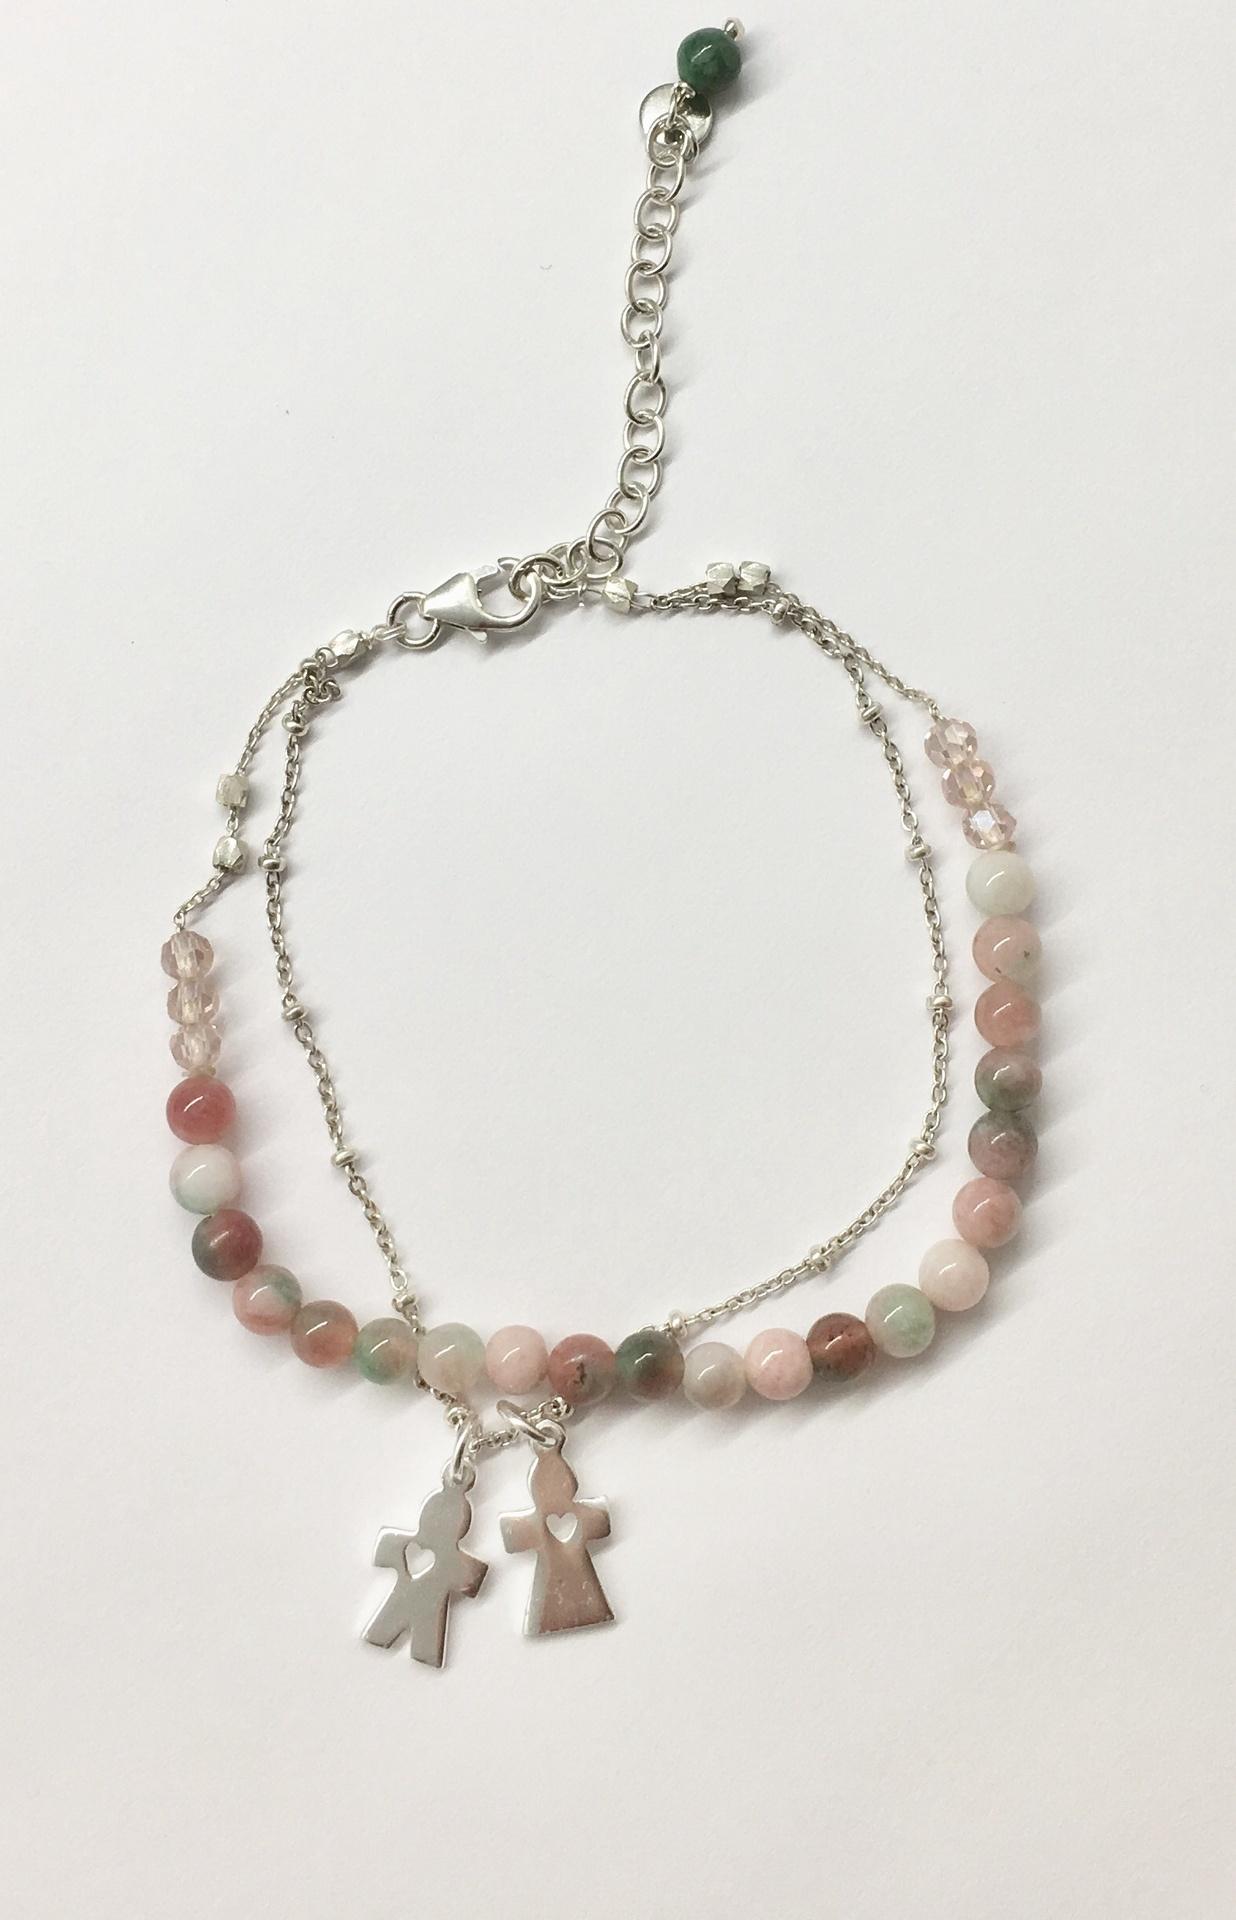 Annabella Moore- Male & Female Charm Bracelet